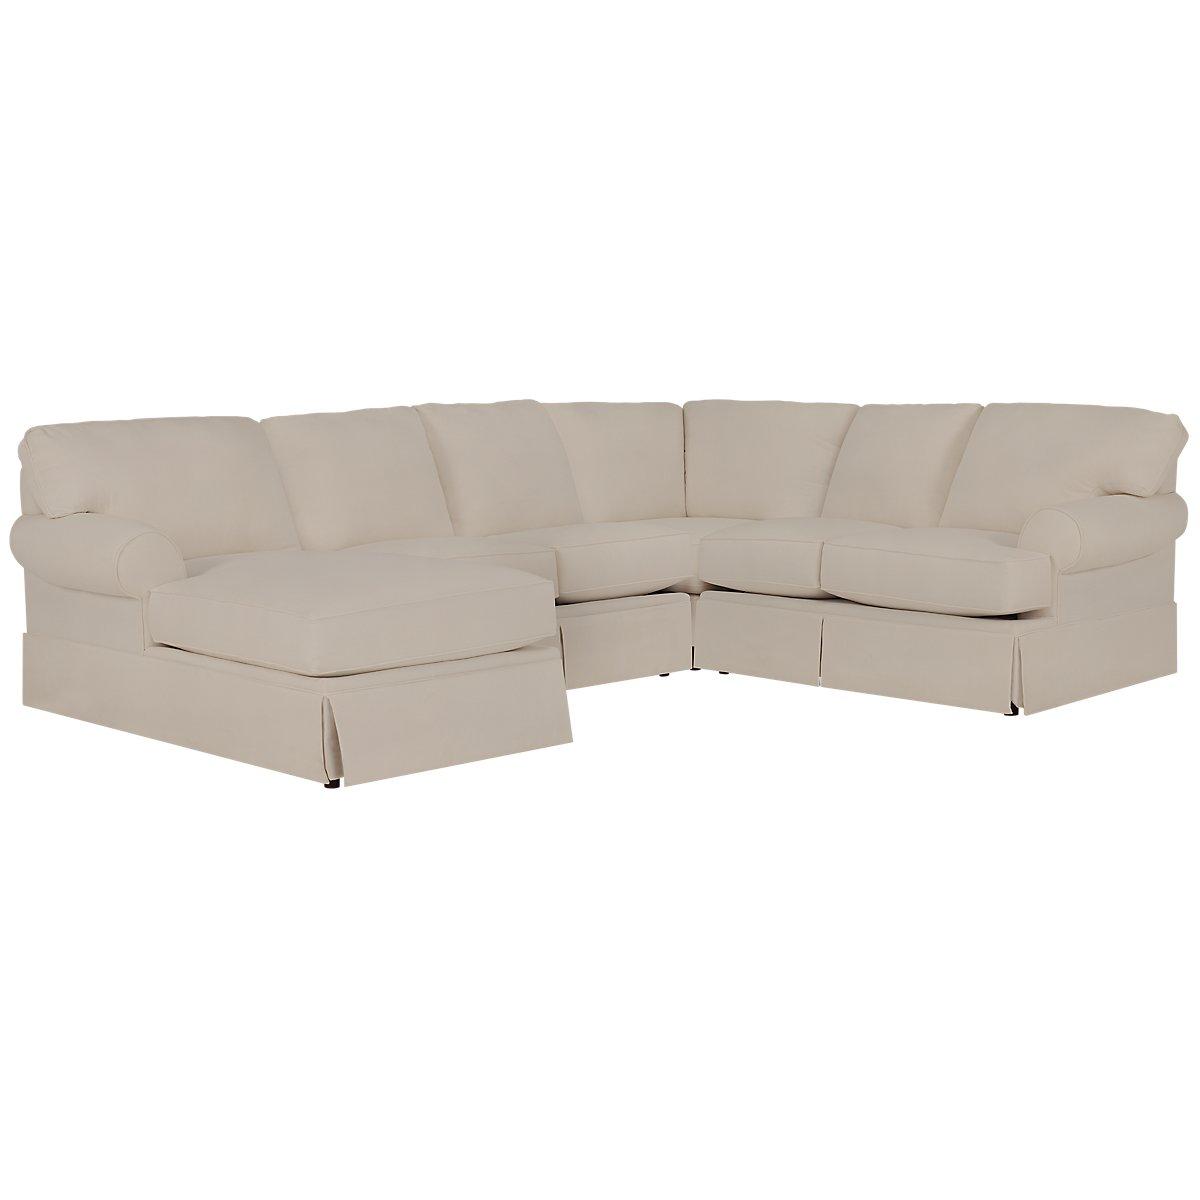 City furniture turner khaki fabric medium left chaise for Chaise kaki